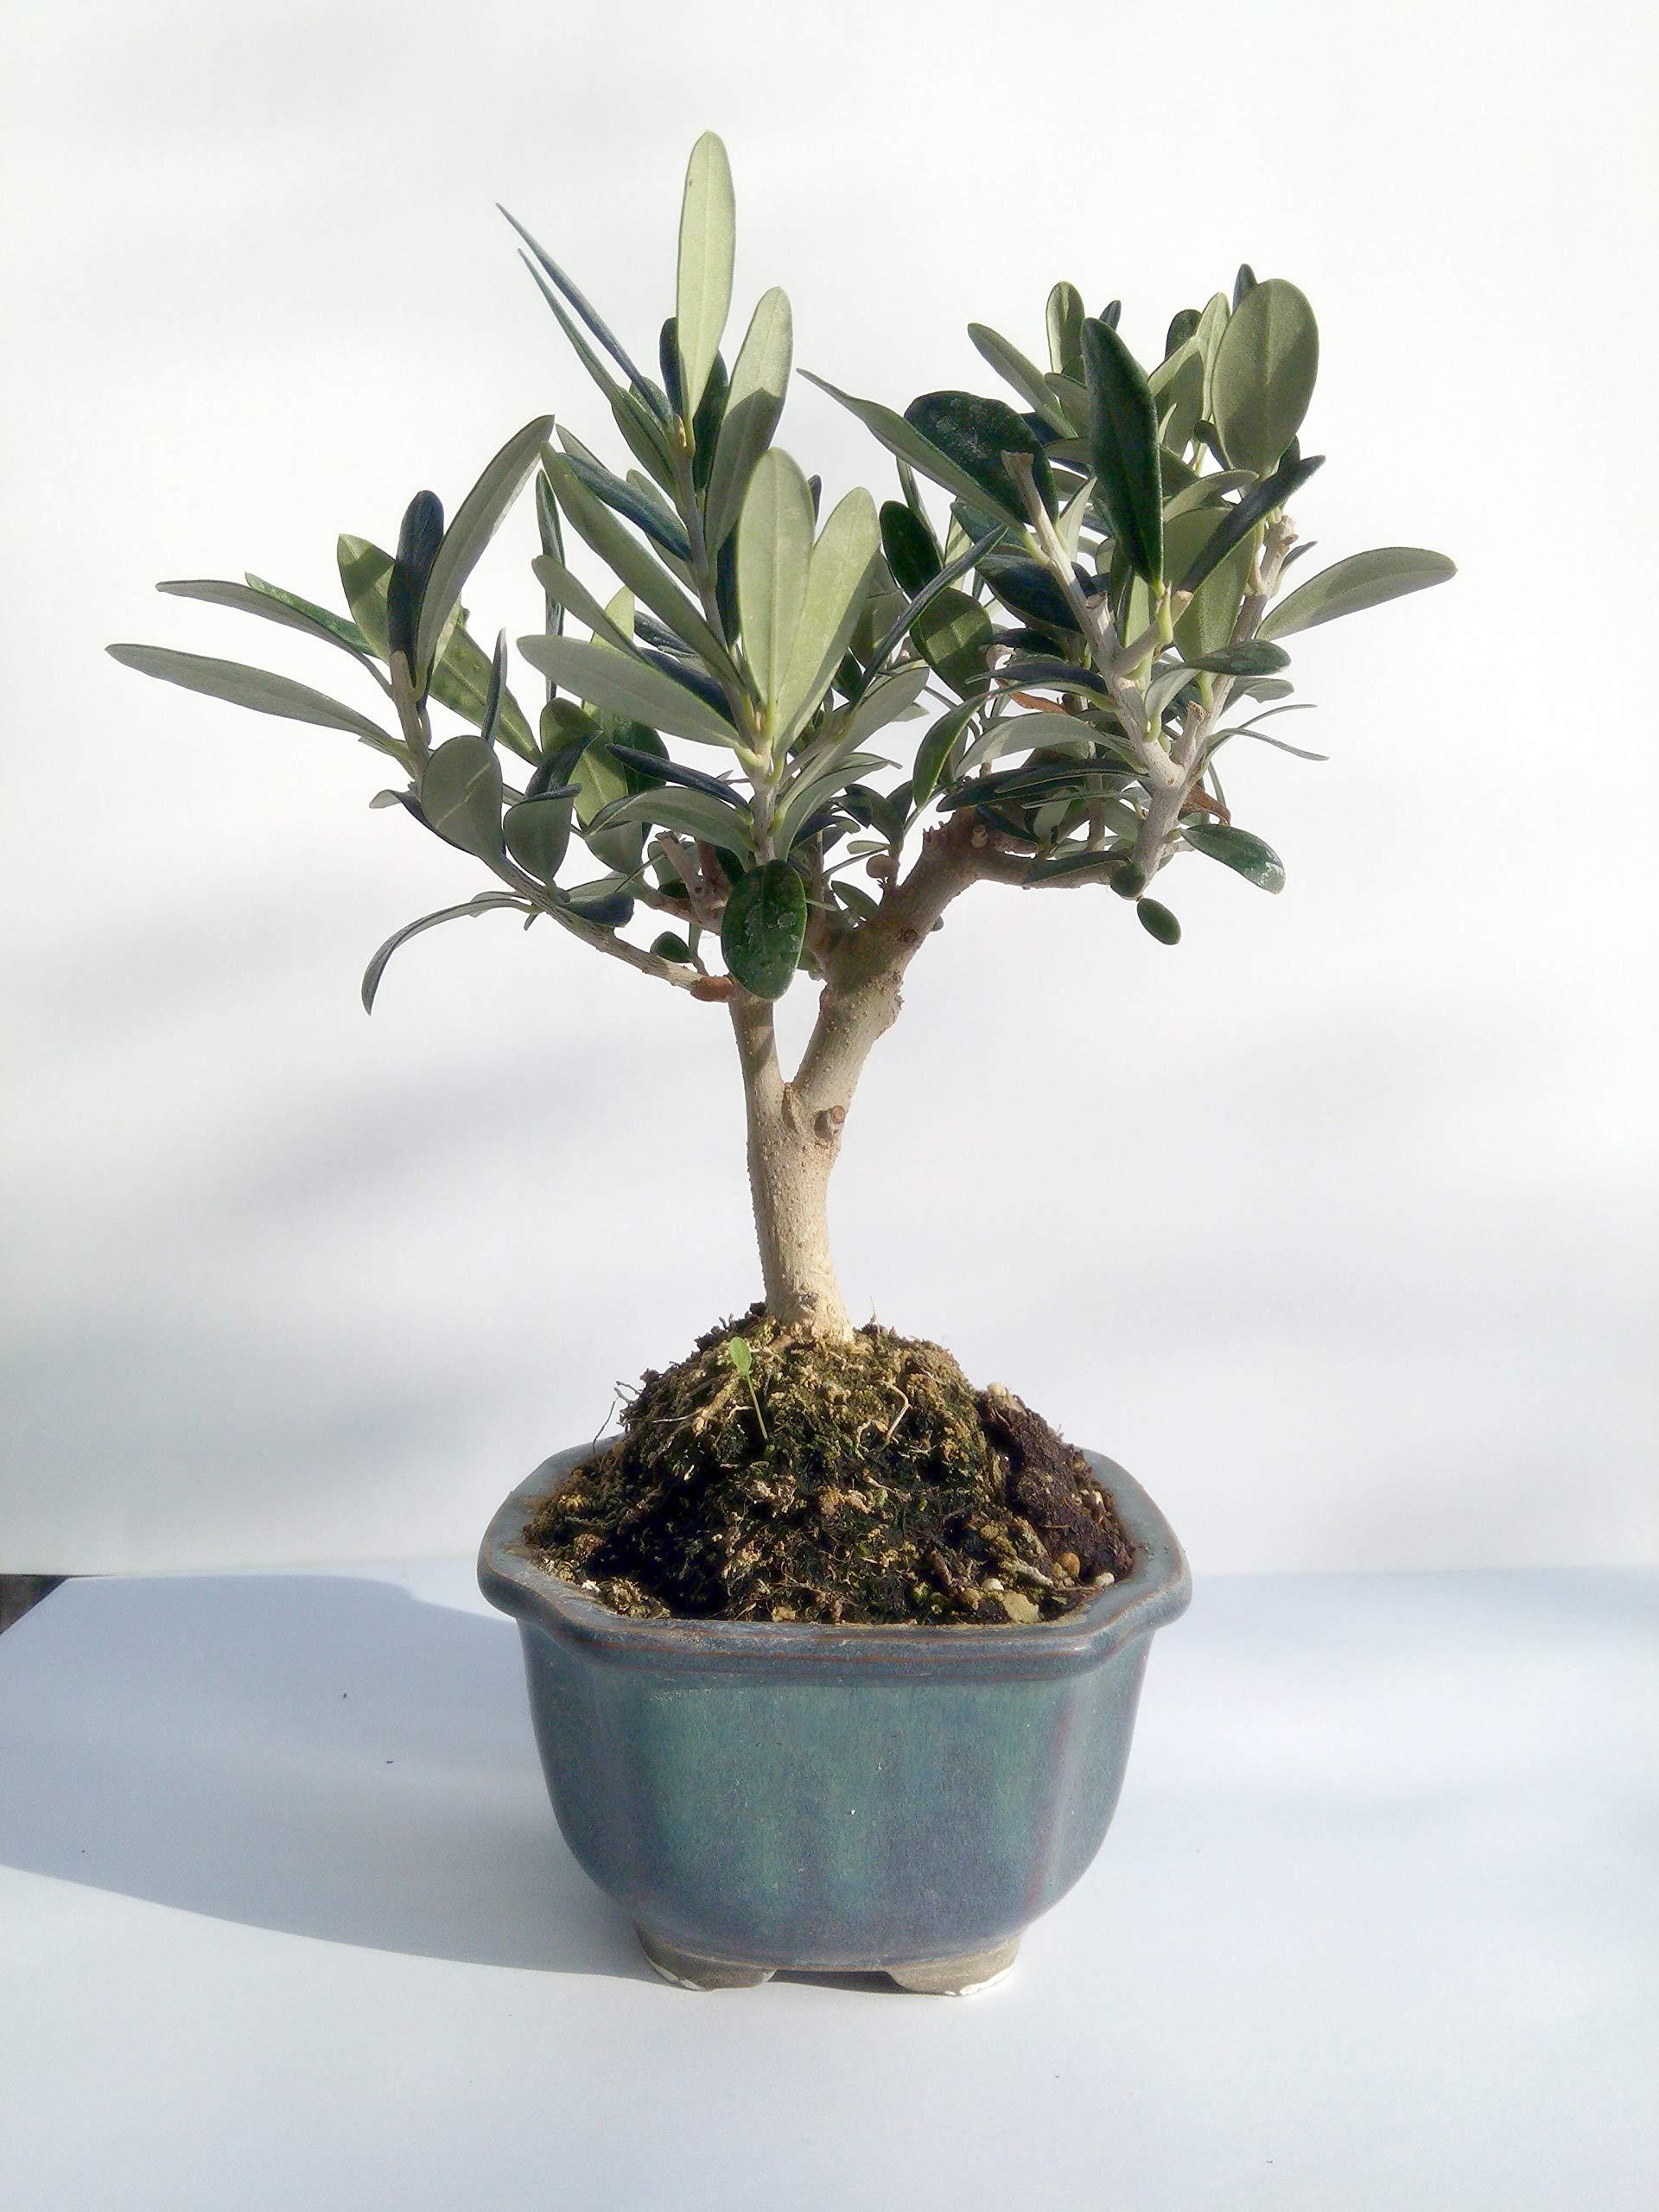 Miniature Bonsai - Olive Tree - 5 Year Old Plant